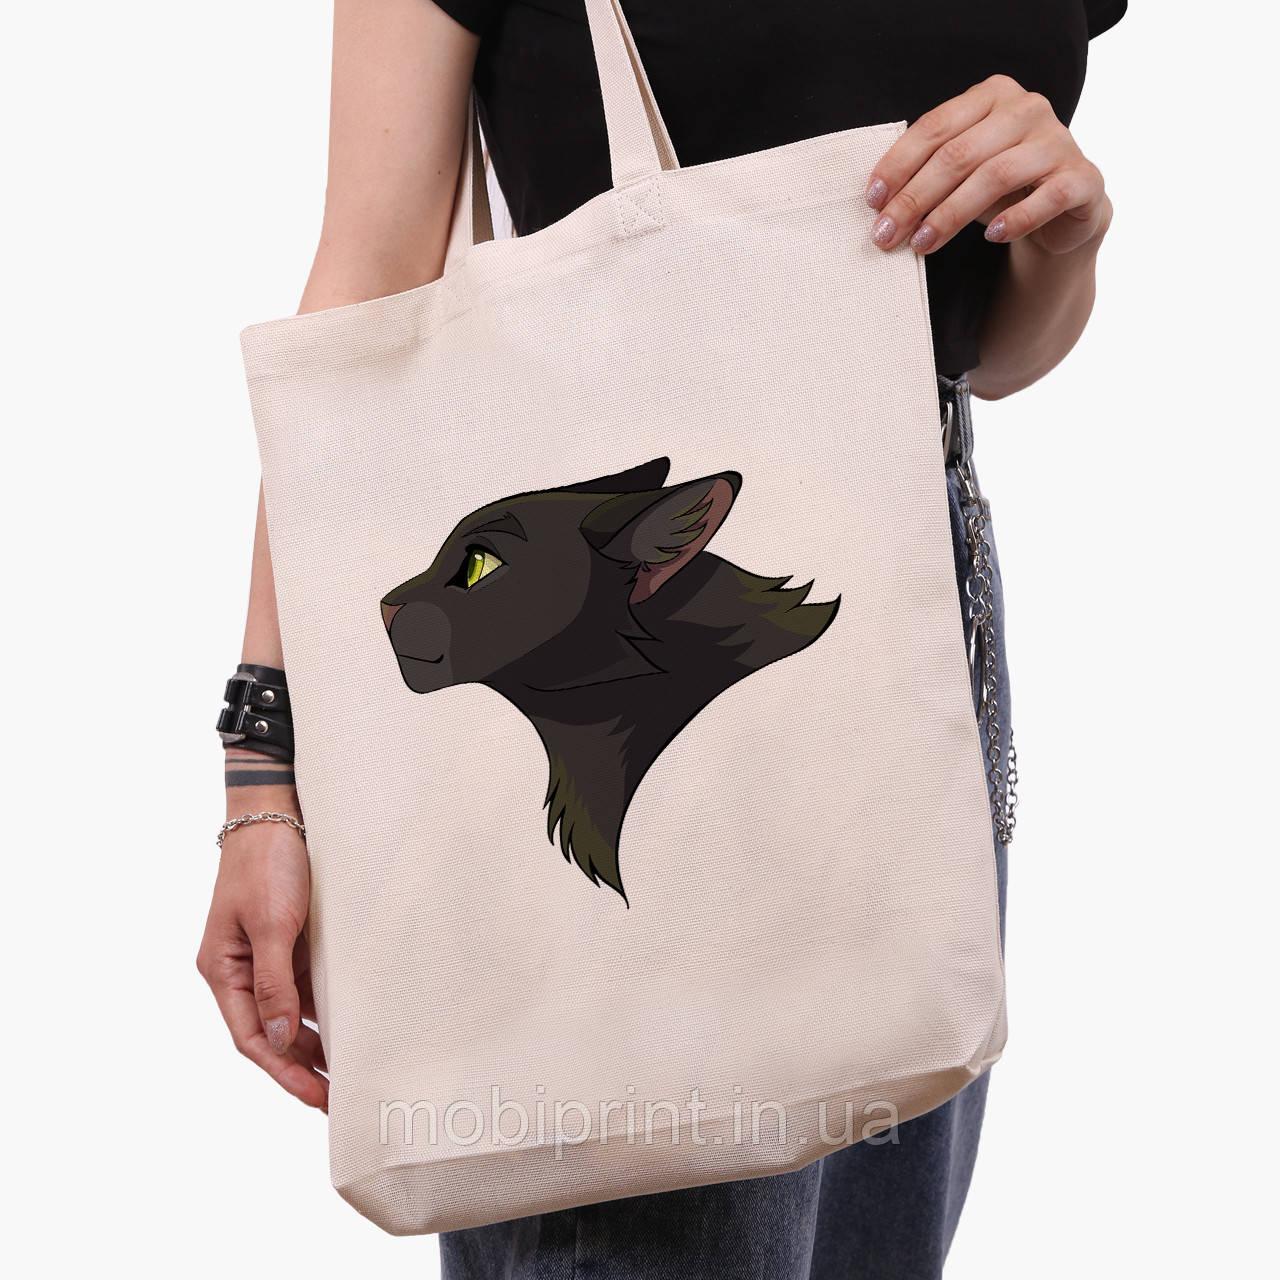 Эко сумка шоппер белая Черная пантера (Black panther) (9227-2844-1)  41*39*8 см